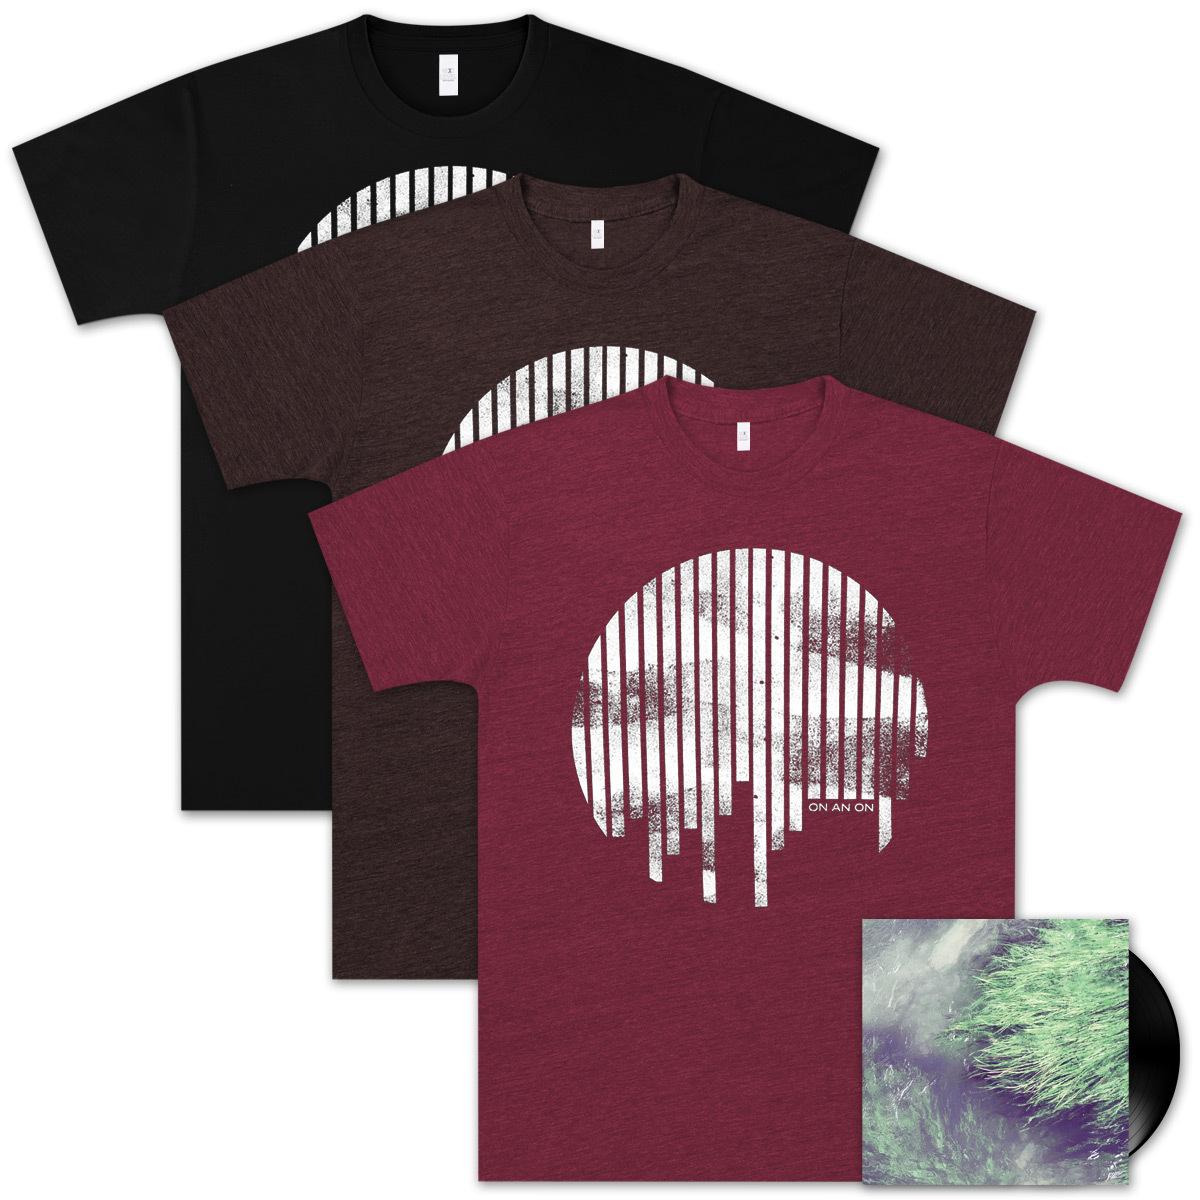 ON AN ON - Vinyl + T-Shirt Bundle